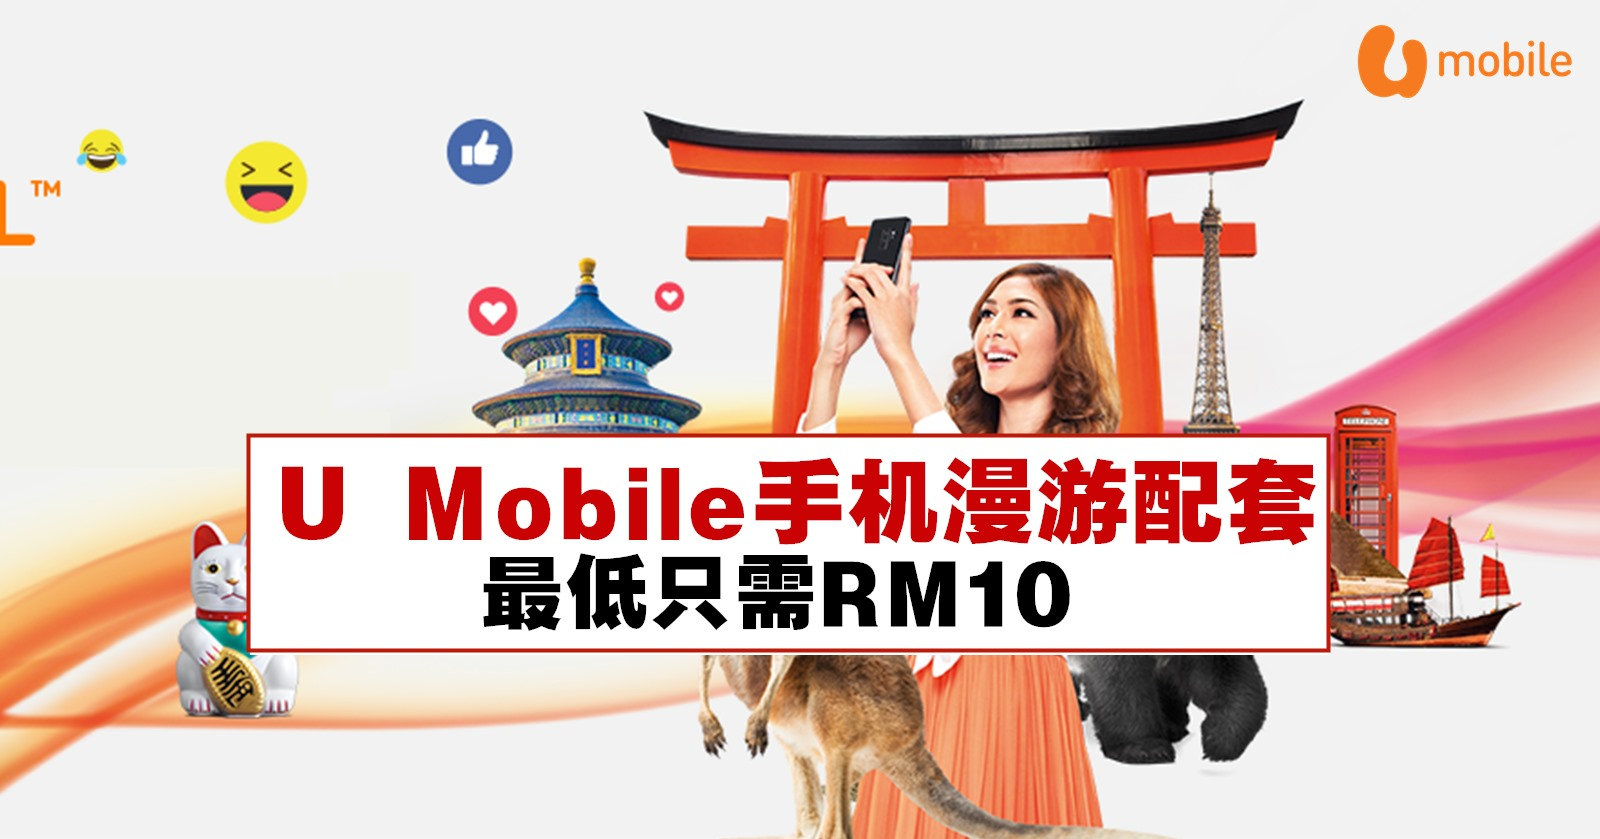 U Mobile手机漫游配套,最低只需RM10